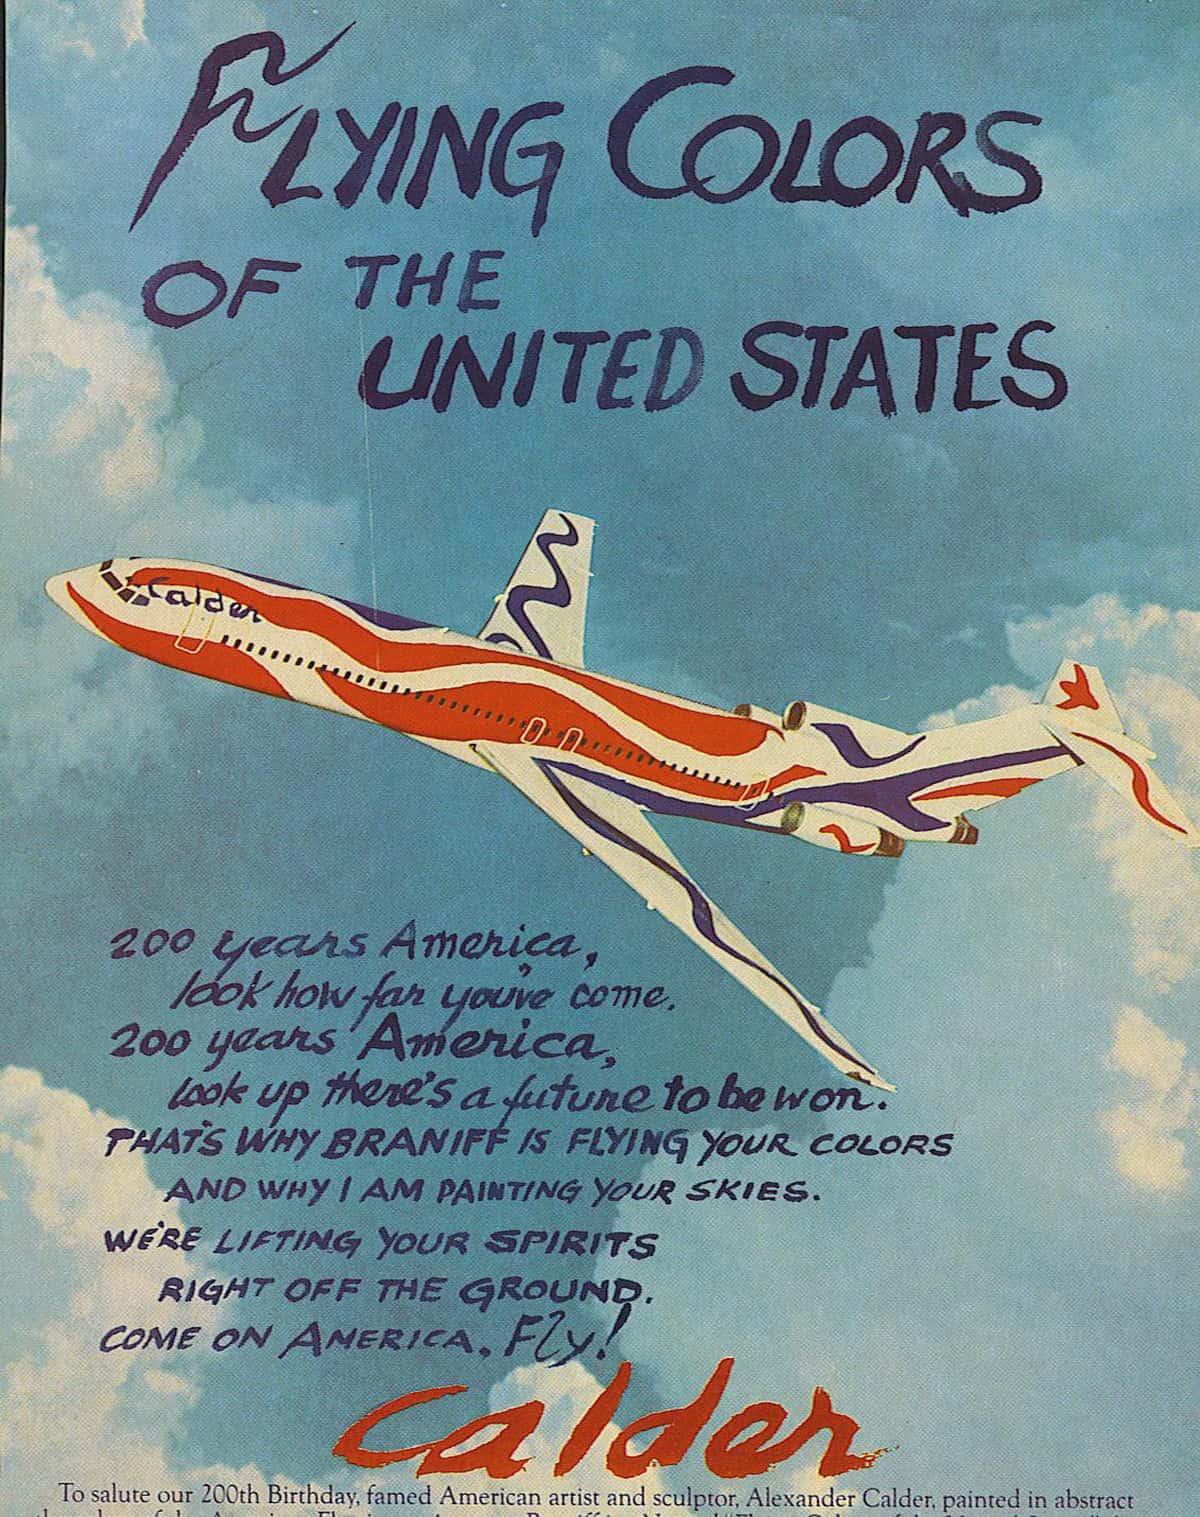 Braniff airplane by Alexander Calder ad, 1976